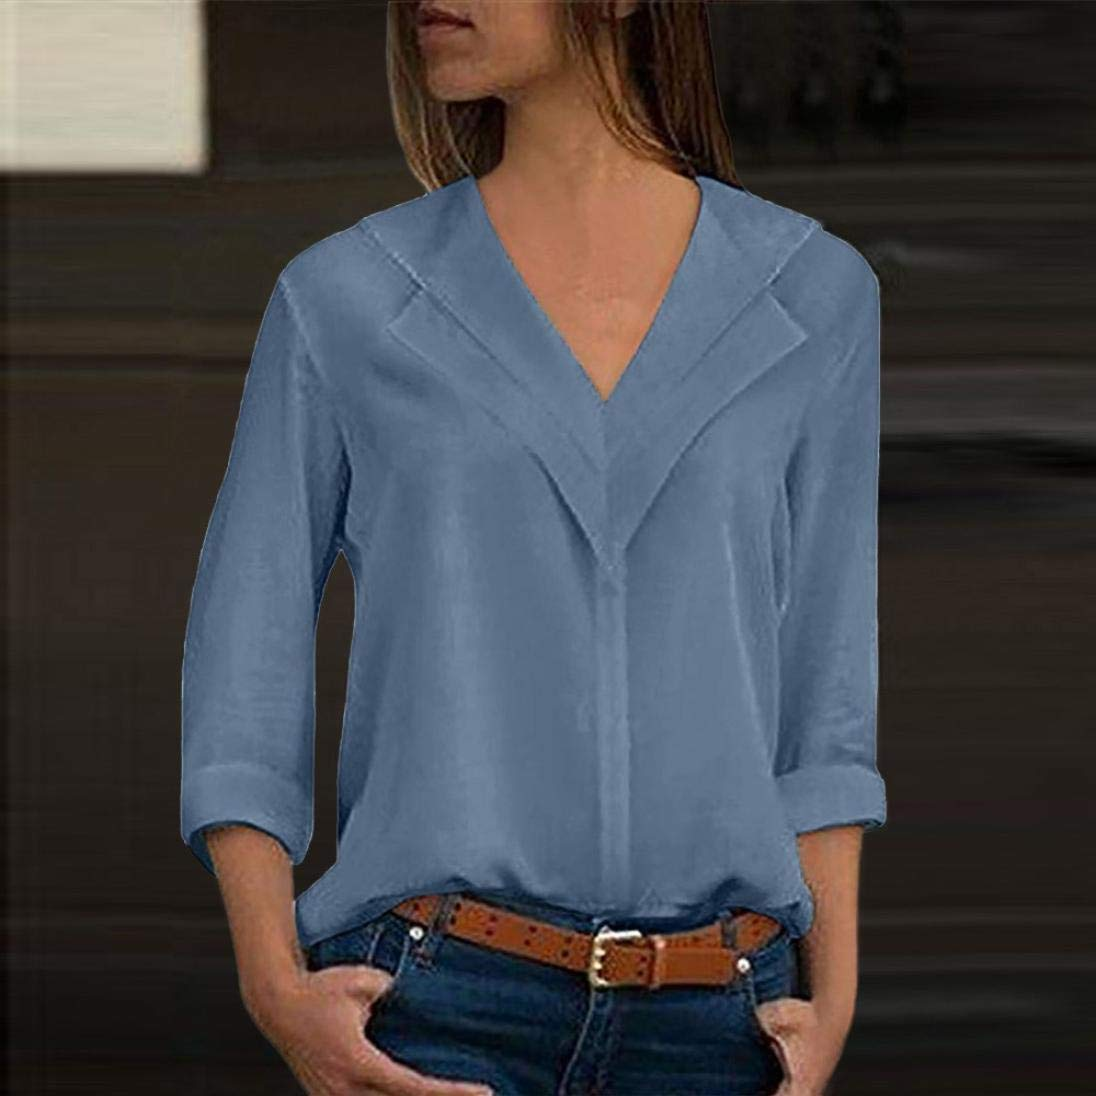 ❤ Blusa con Manga de chifón para Mujer, Camiseta sólida de Moda Office Ladies Plain Tops Manga Larga Absolute: Amazon.es: Ropa y accesorios